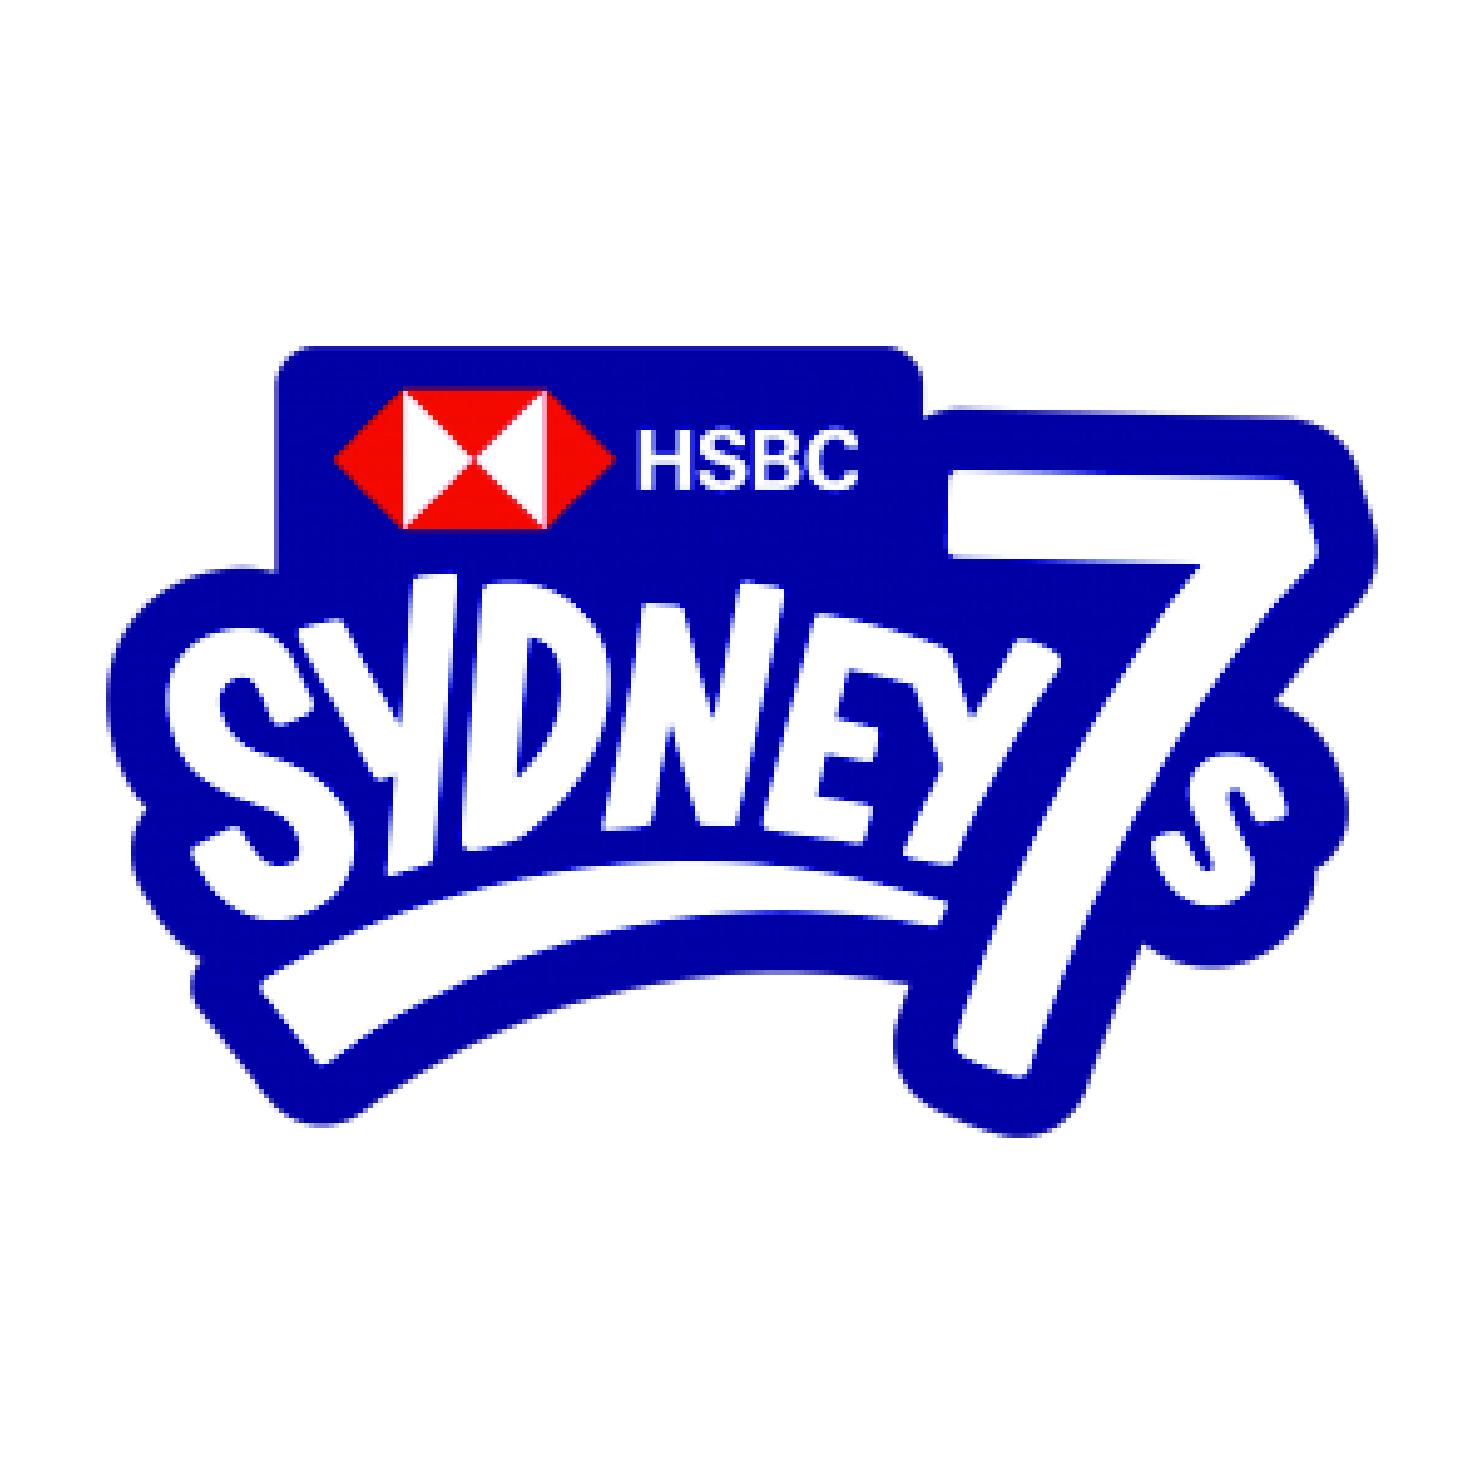 HSBC Sydney Sevens